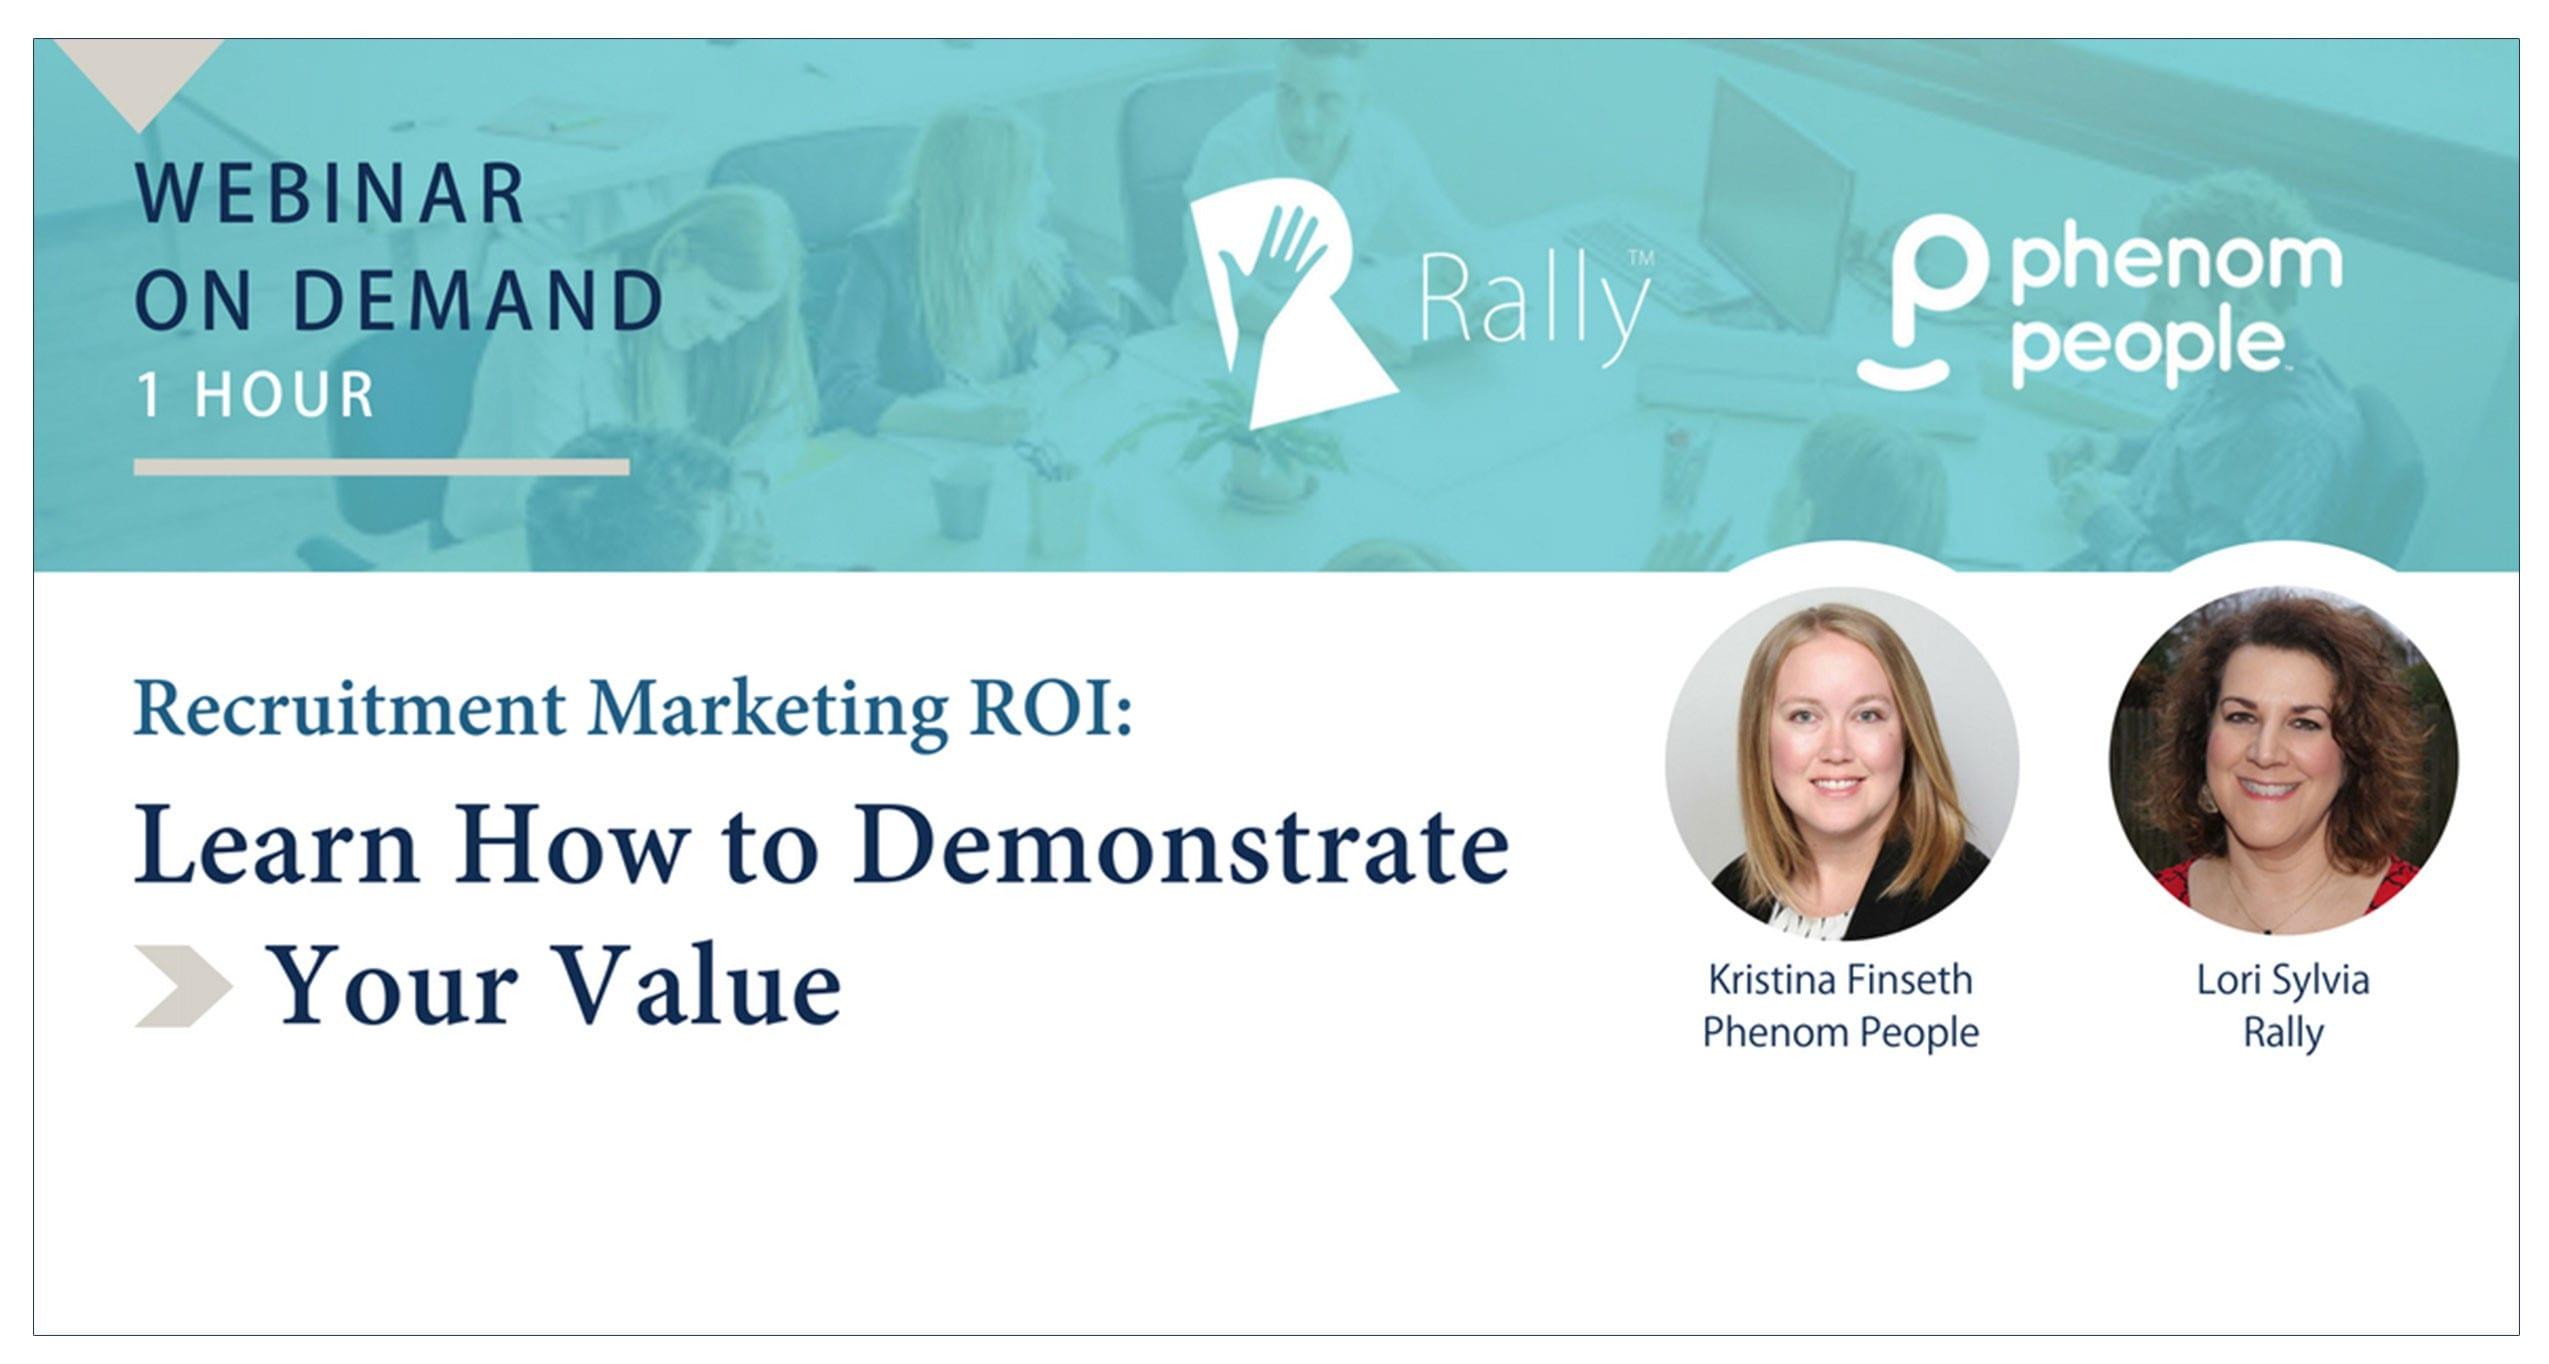 Webinar On Demand: Recruitment Marketing ROI | Rally